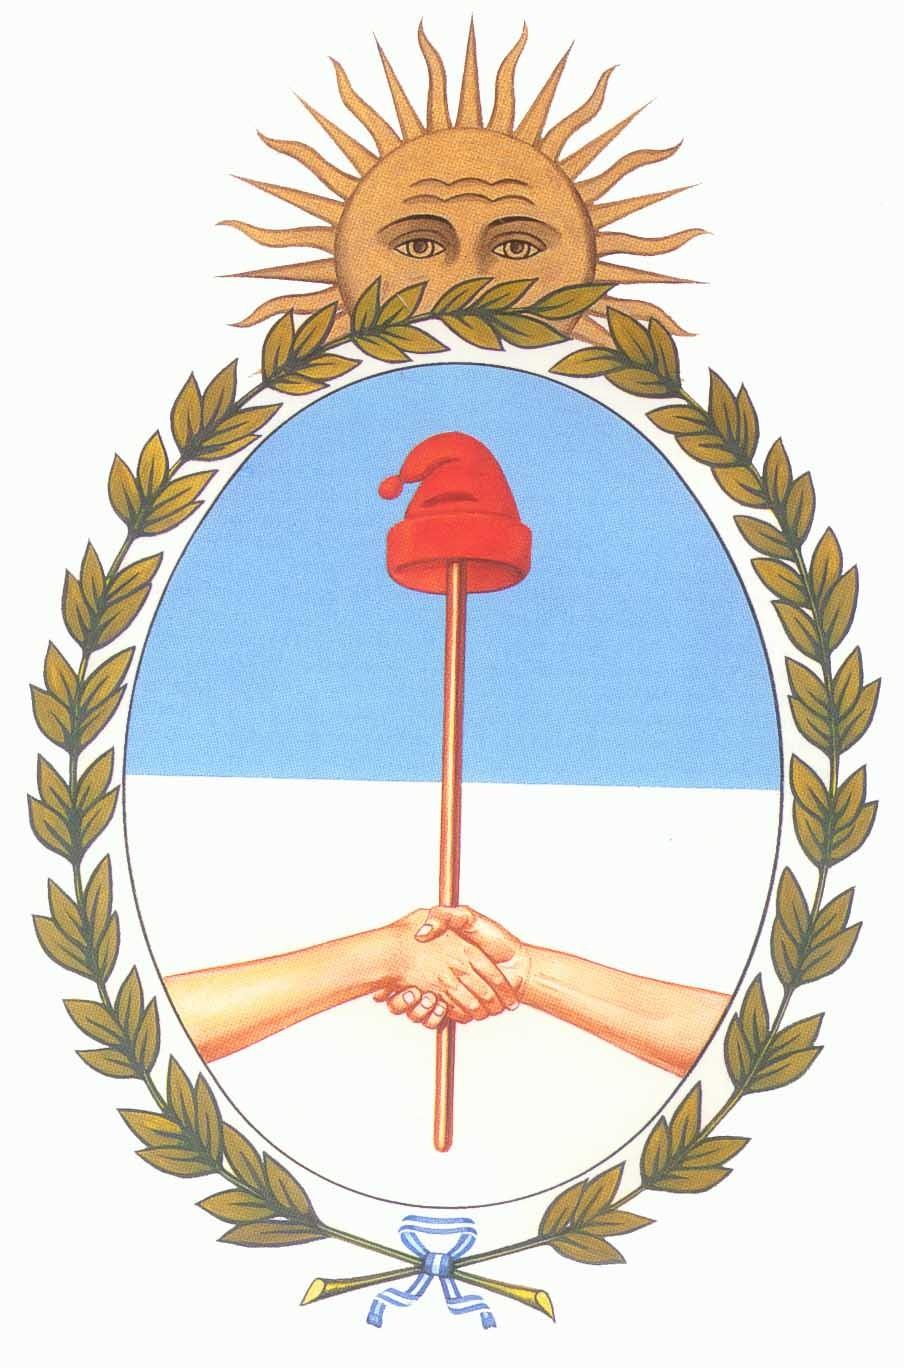 foto de escudos: